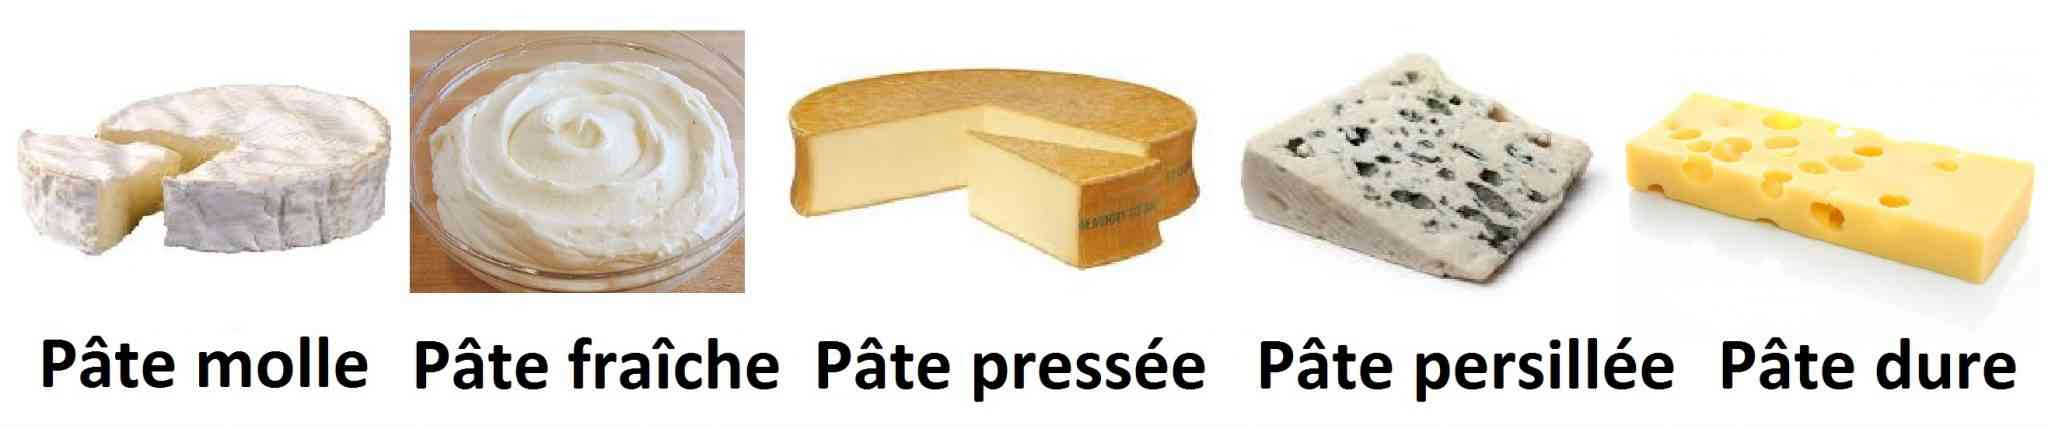 pâte_molle_fraîche_persillée_pressée_dure